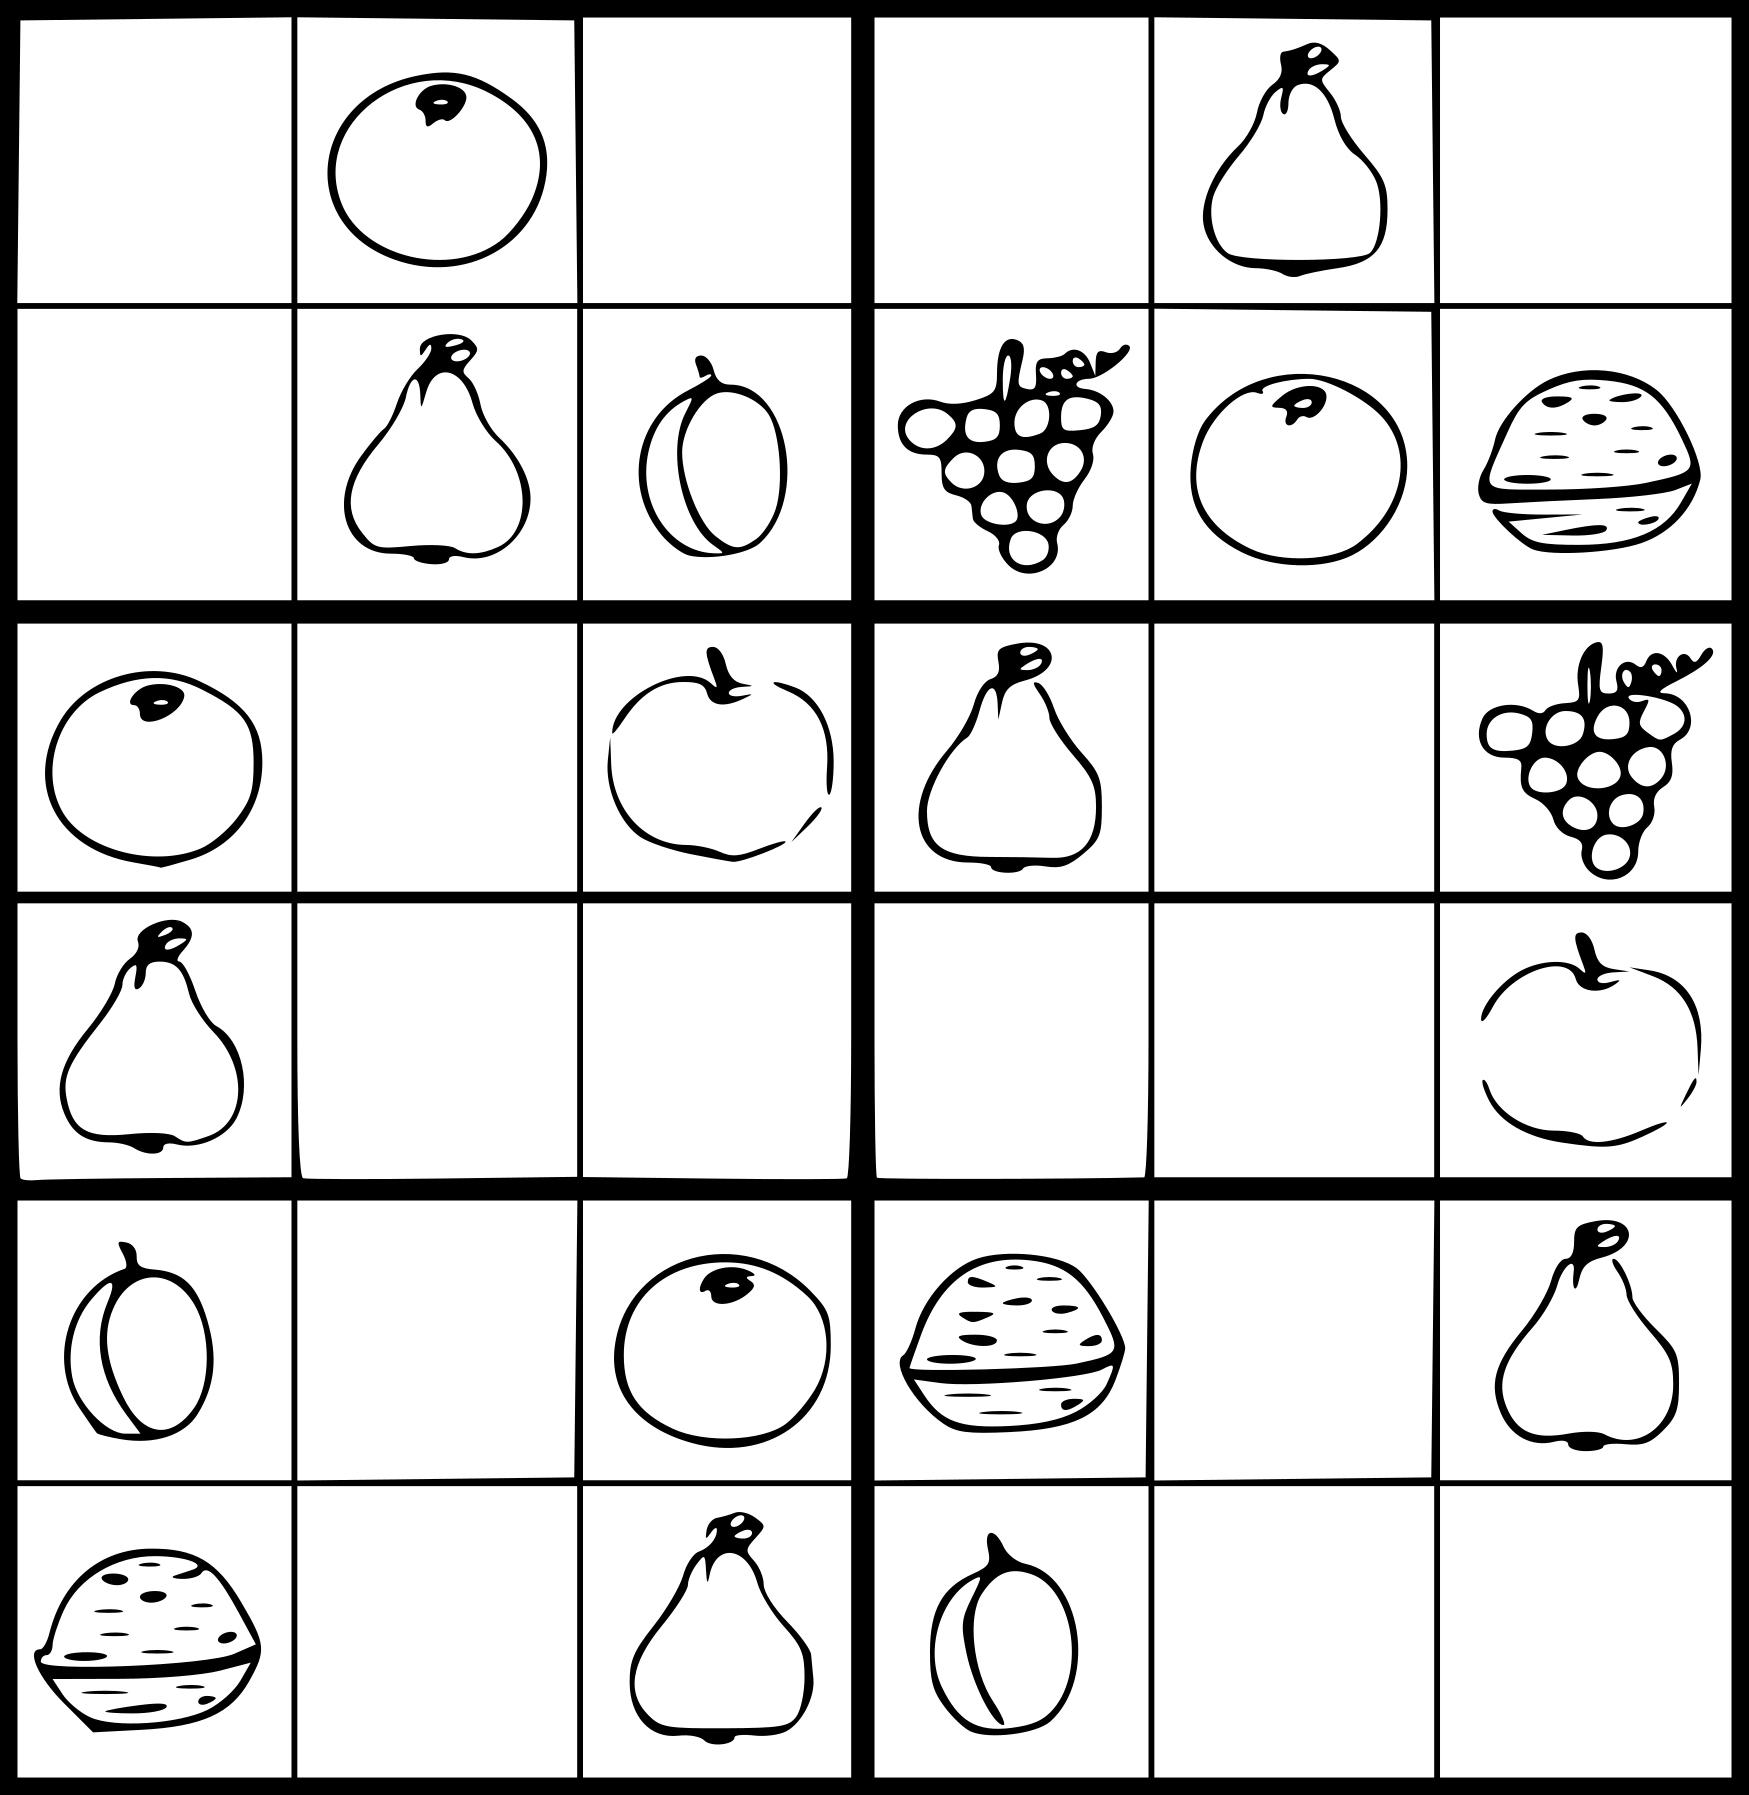 Coloriage Sudoku À Imprimer avec Sudoku A Imprimer